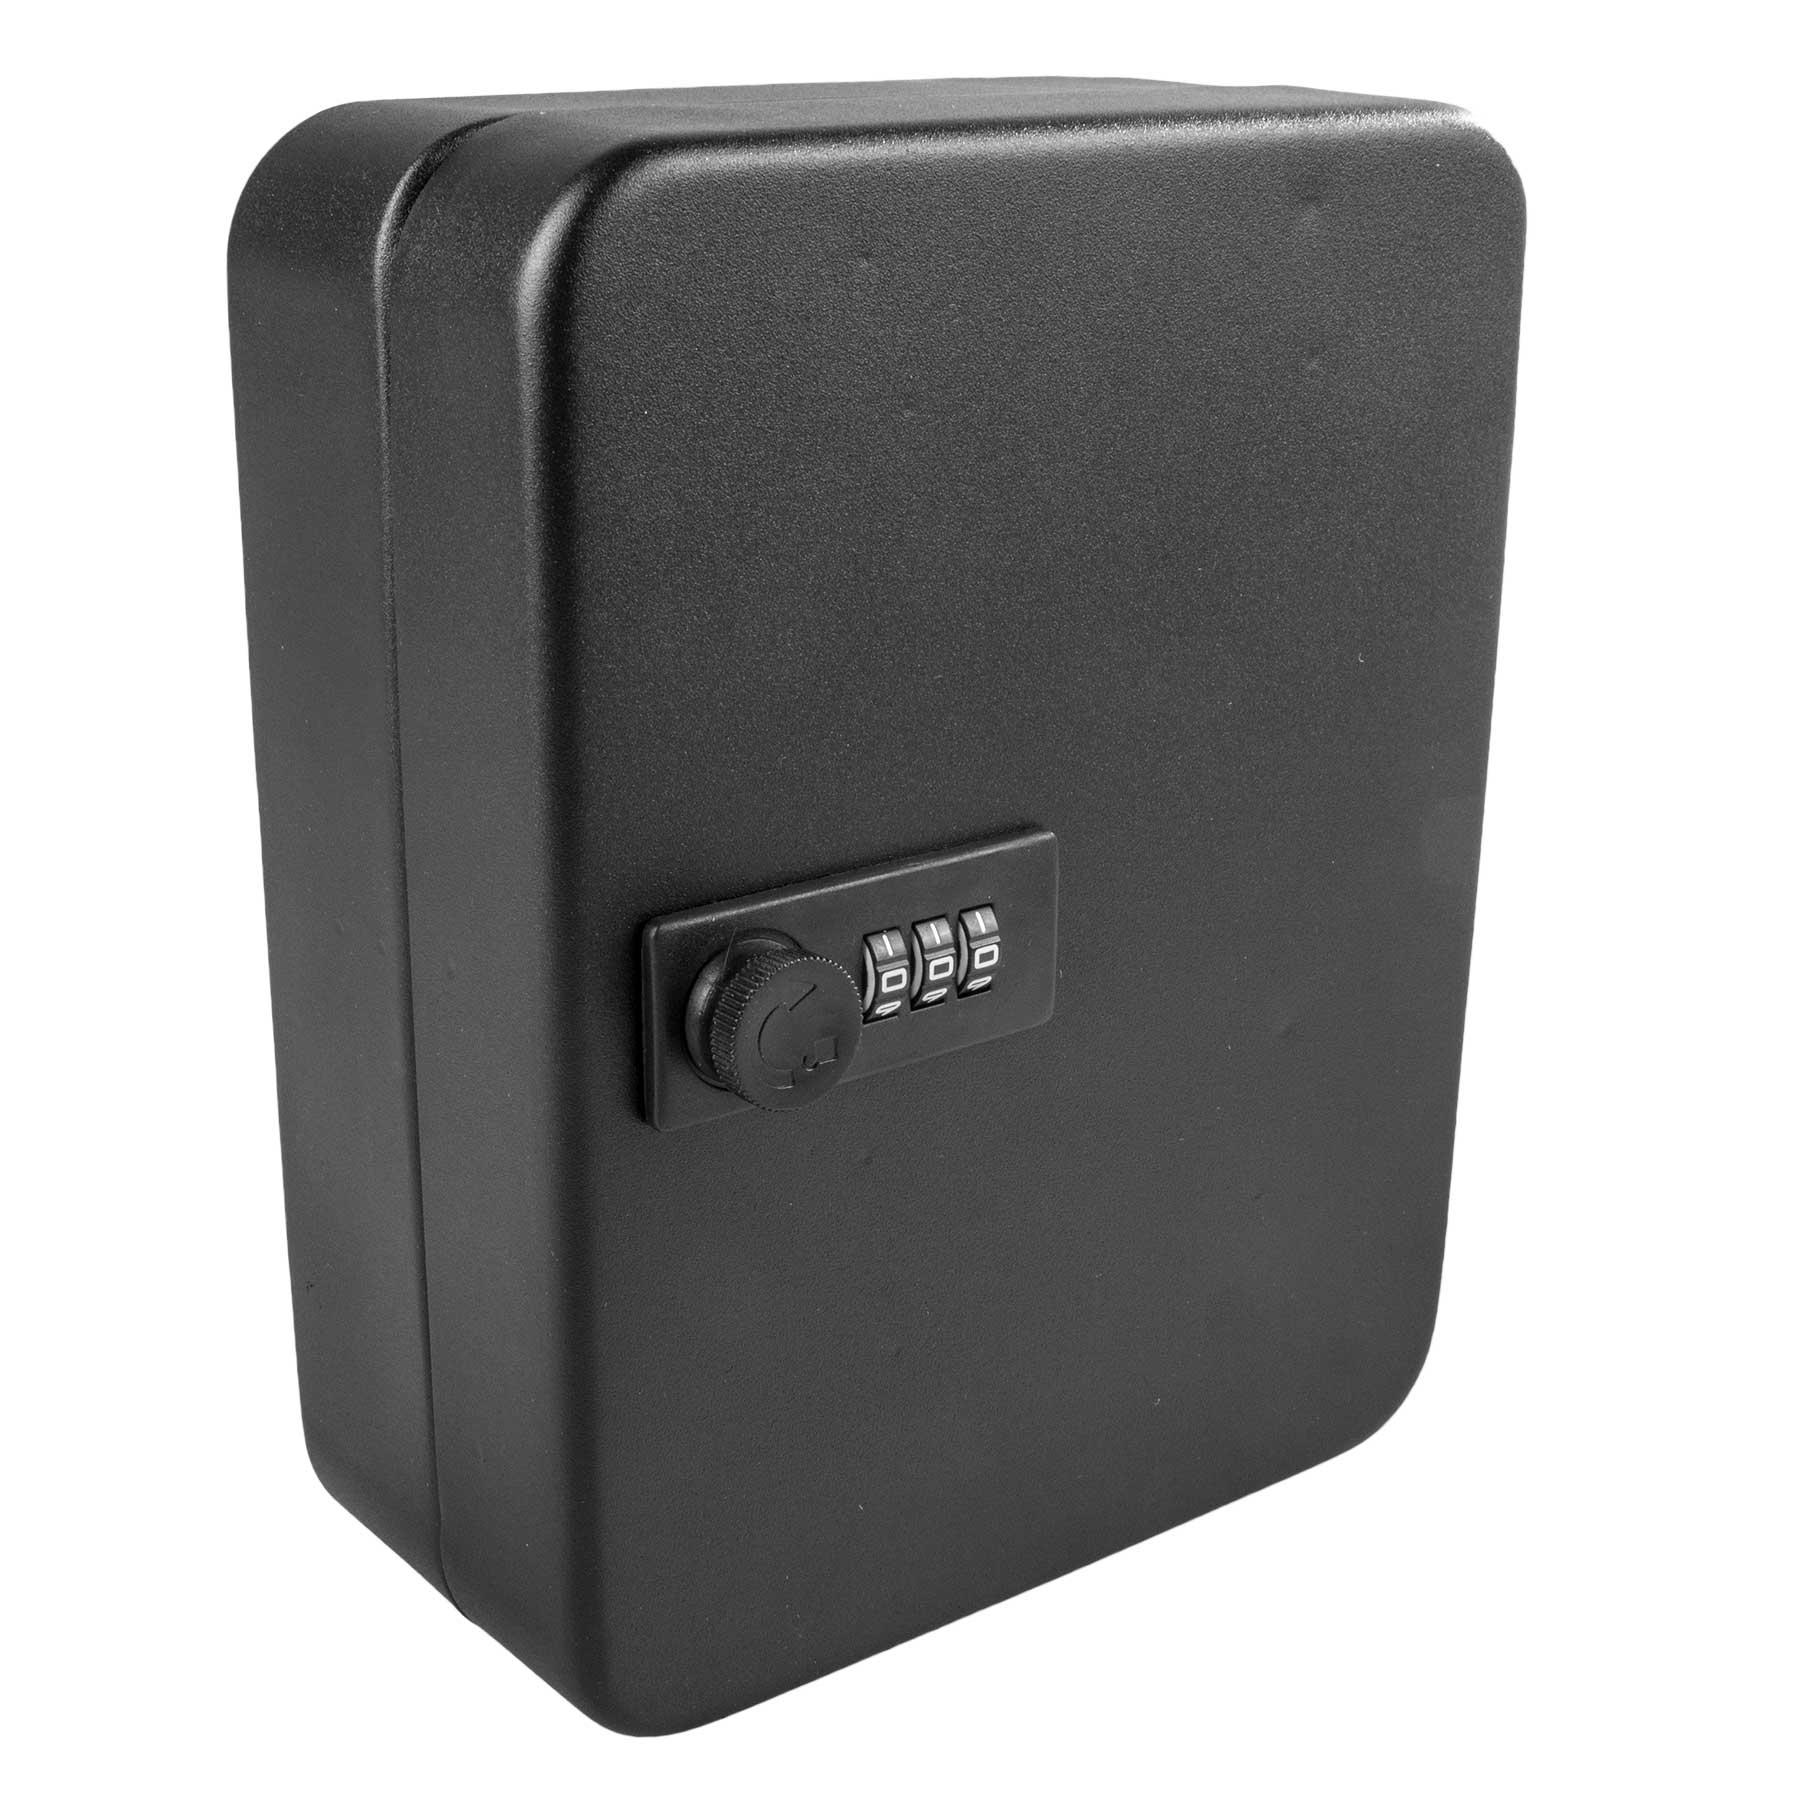 Silverline 542519 Combination Locking Key Cabinet